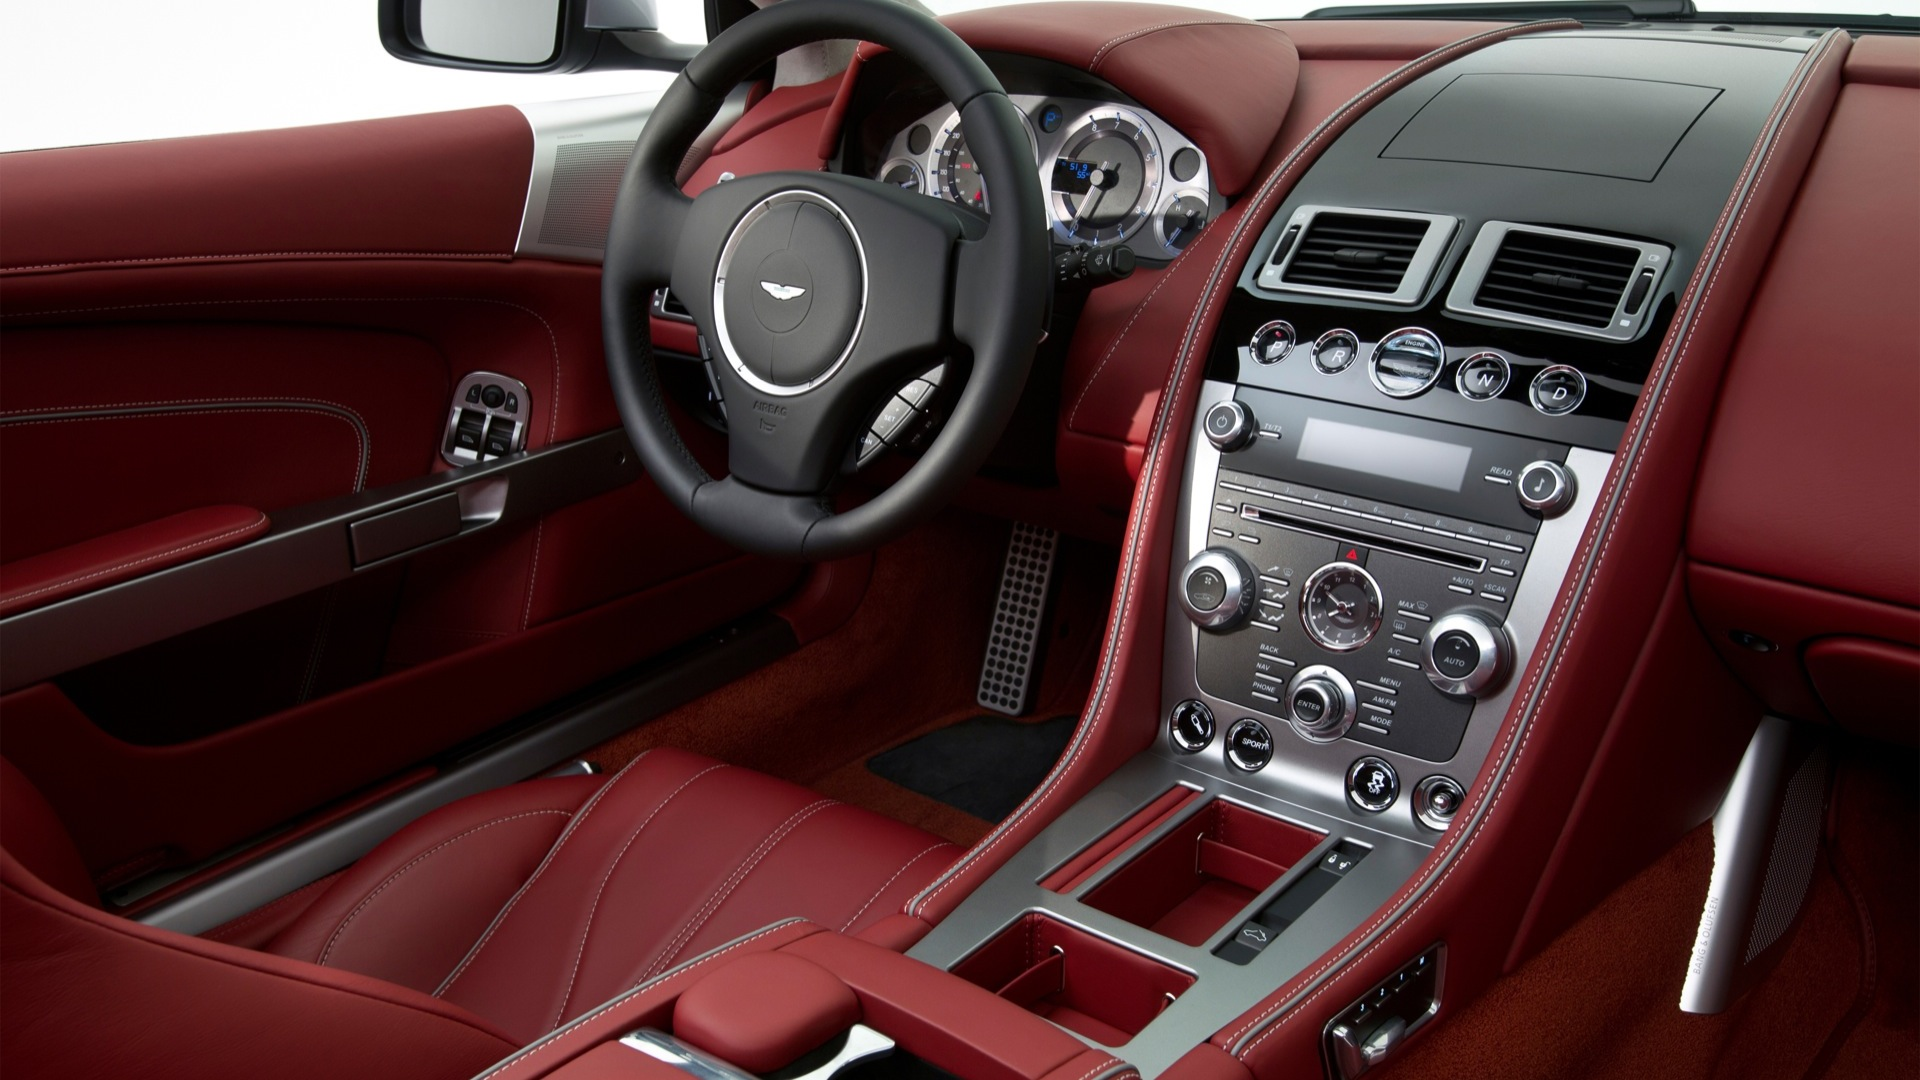 Aston Martin DB9 Interior Car s Overdrive